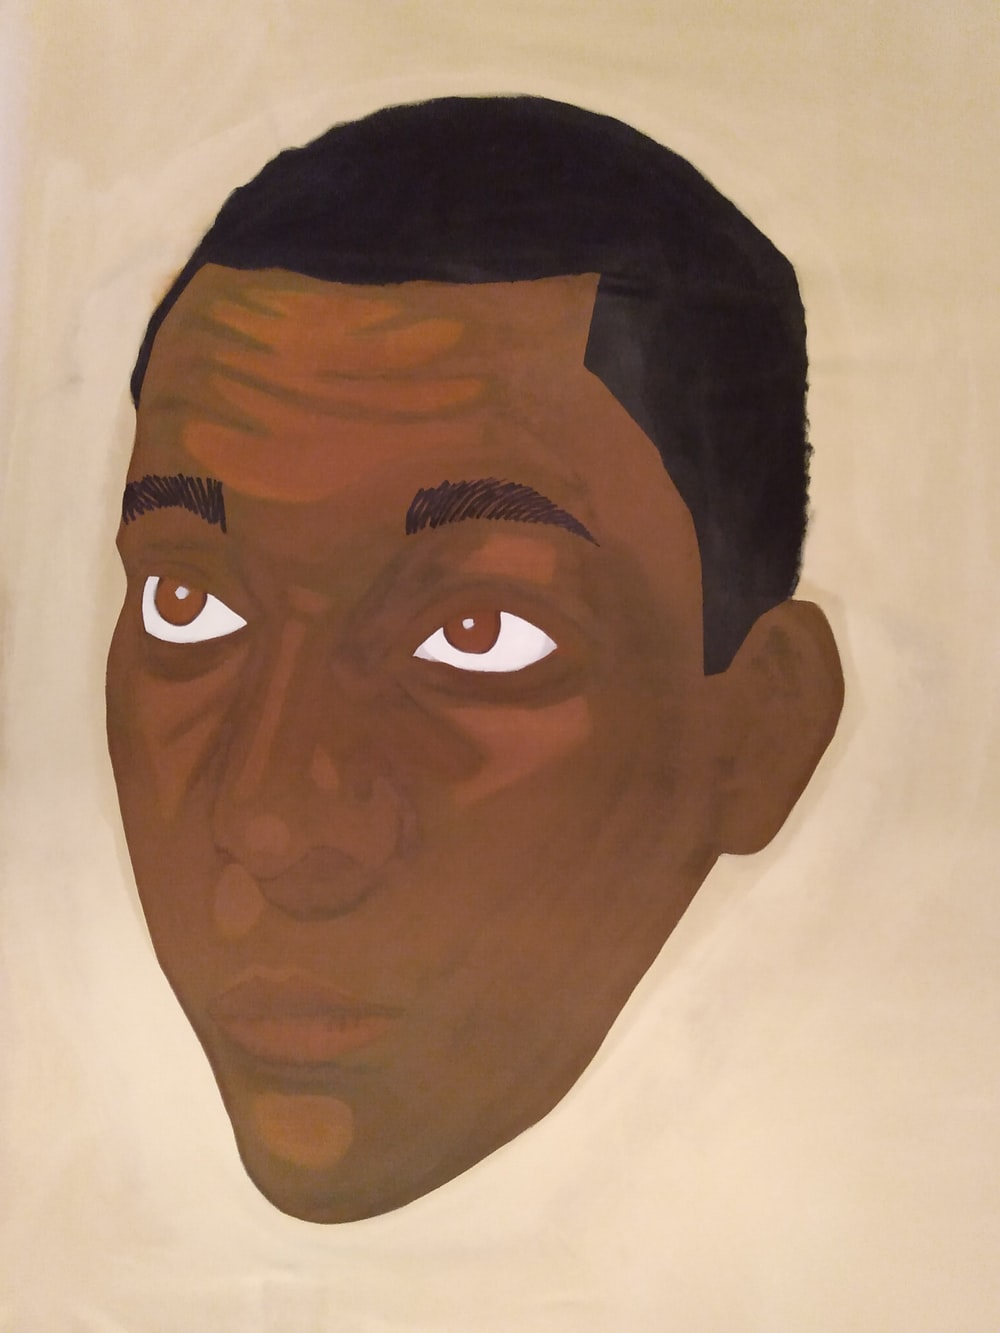 man in white collared shirt